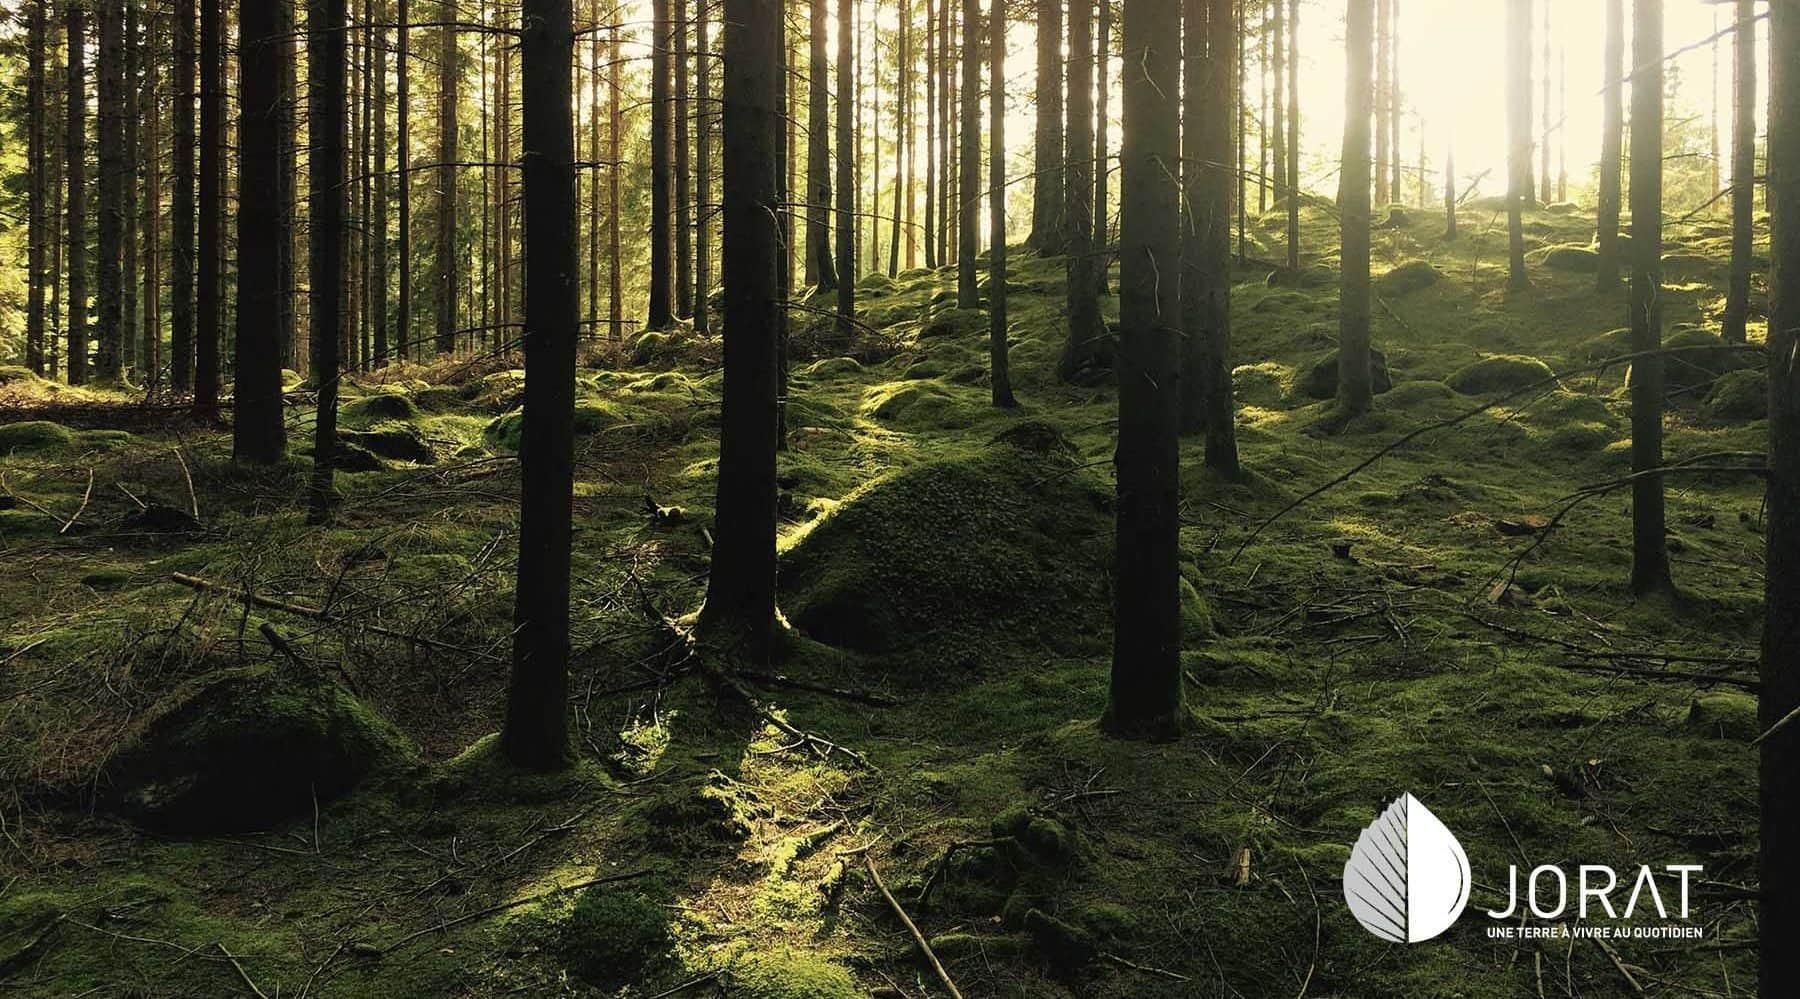 La forêt joratoise